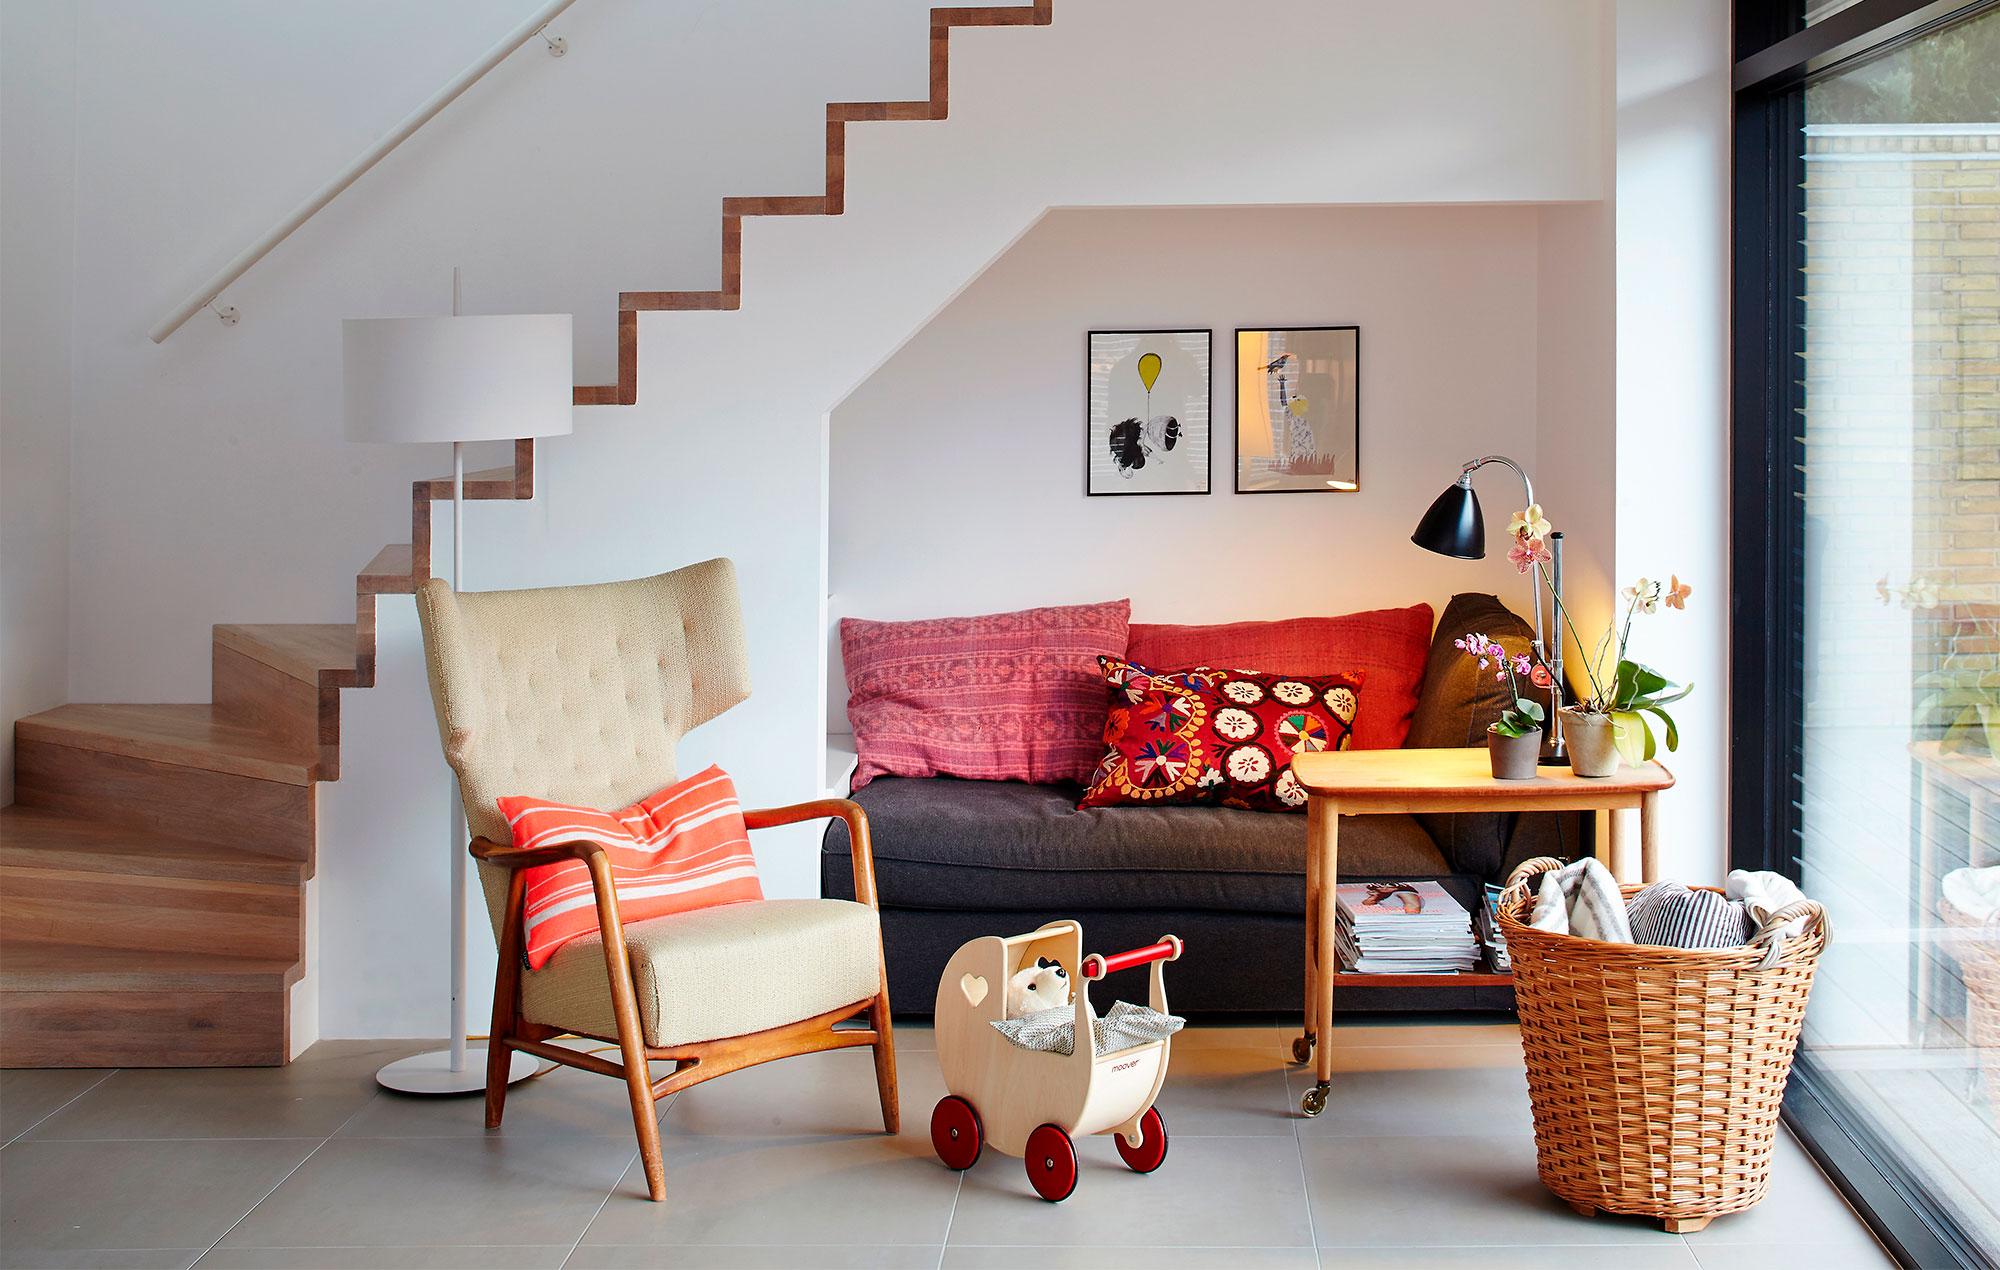 Ny etage med panoramaudsigt   danske boligarkitekter